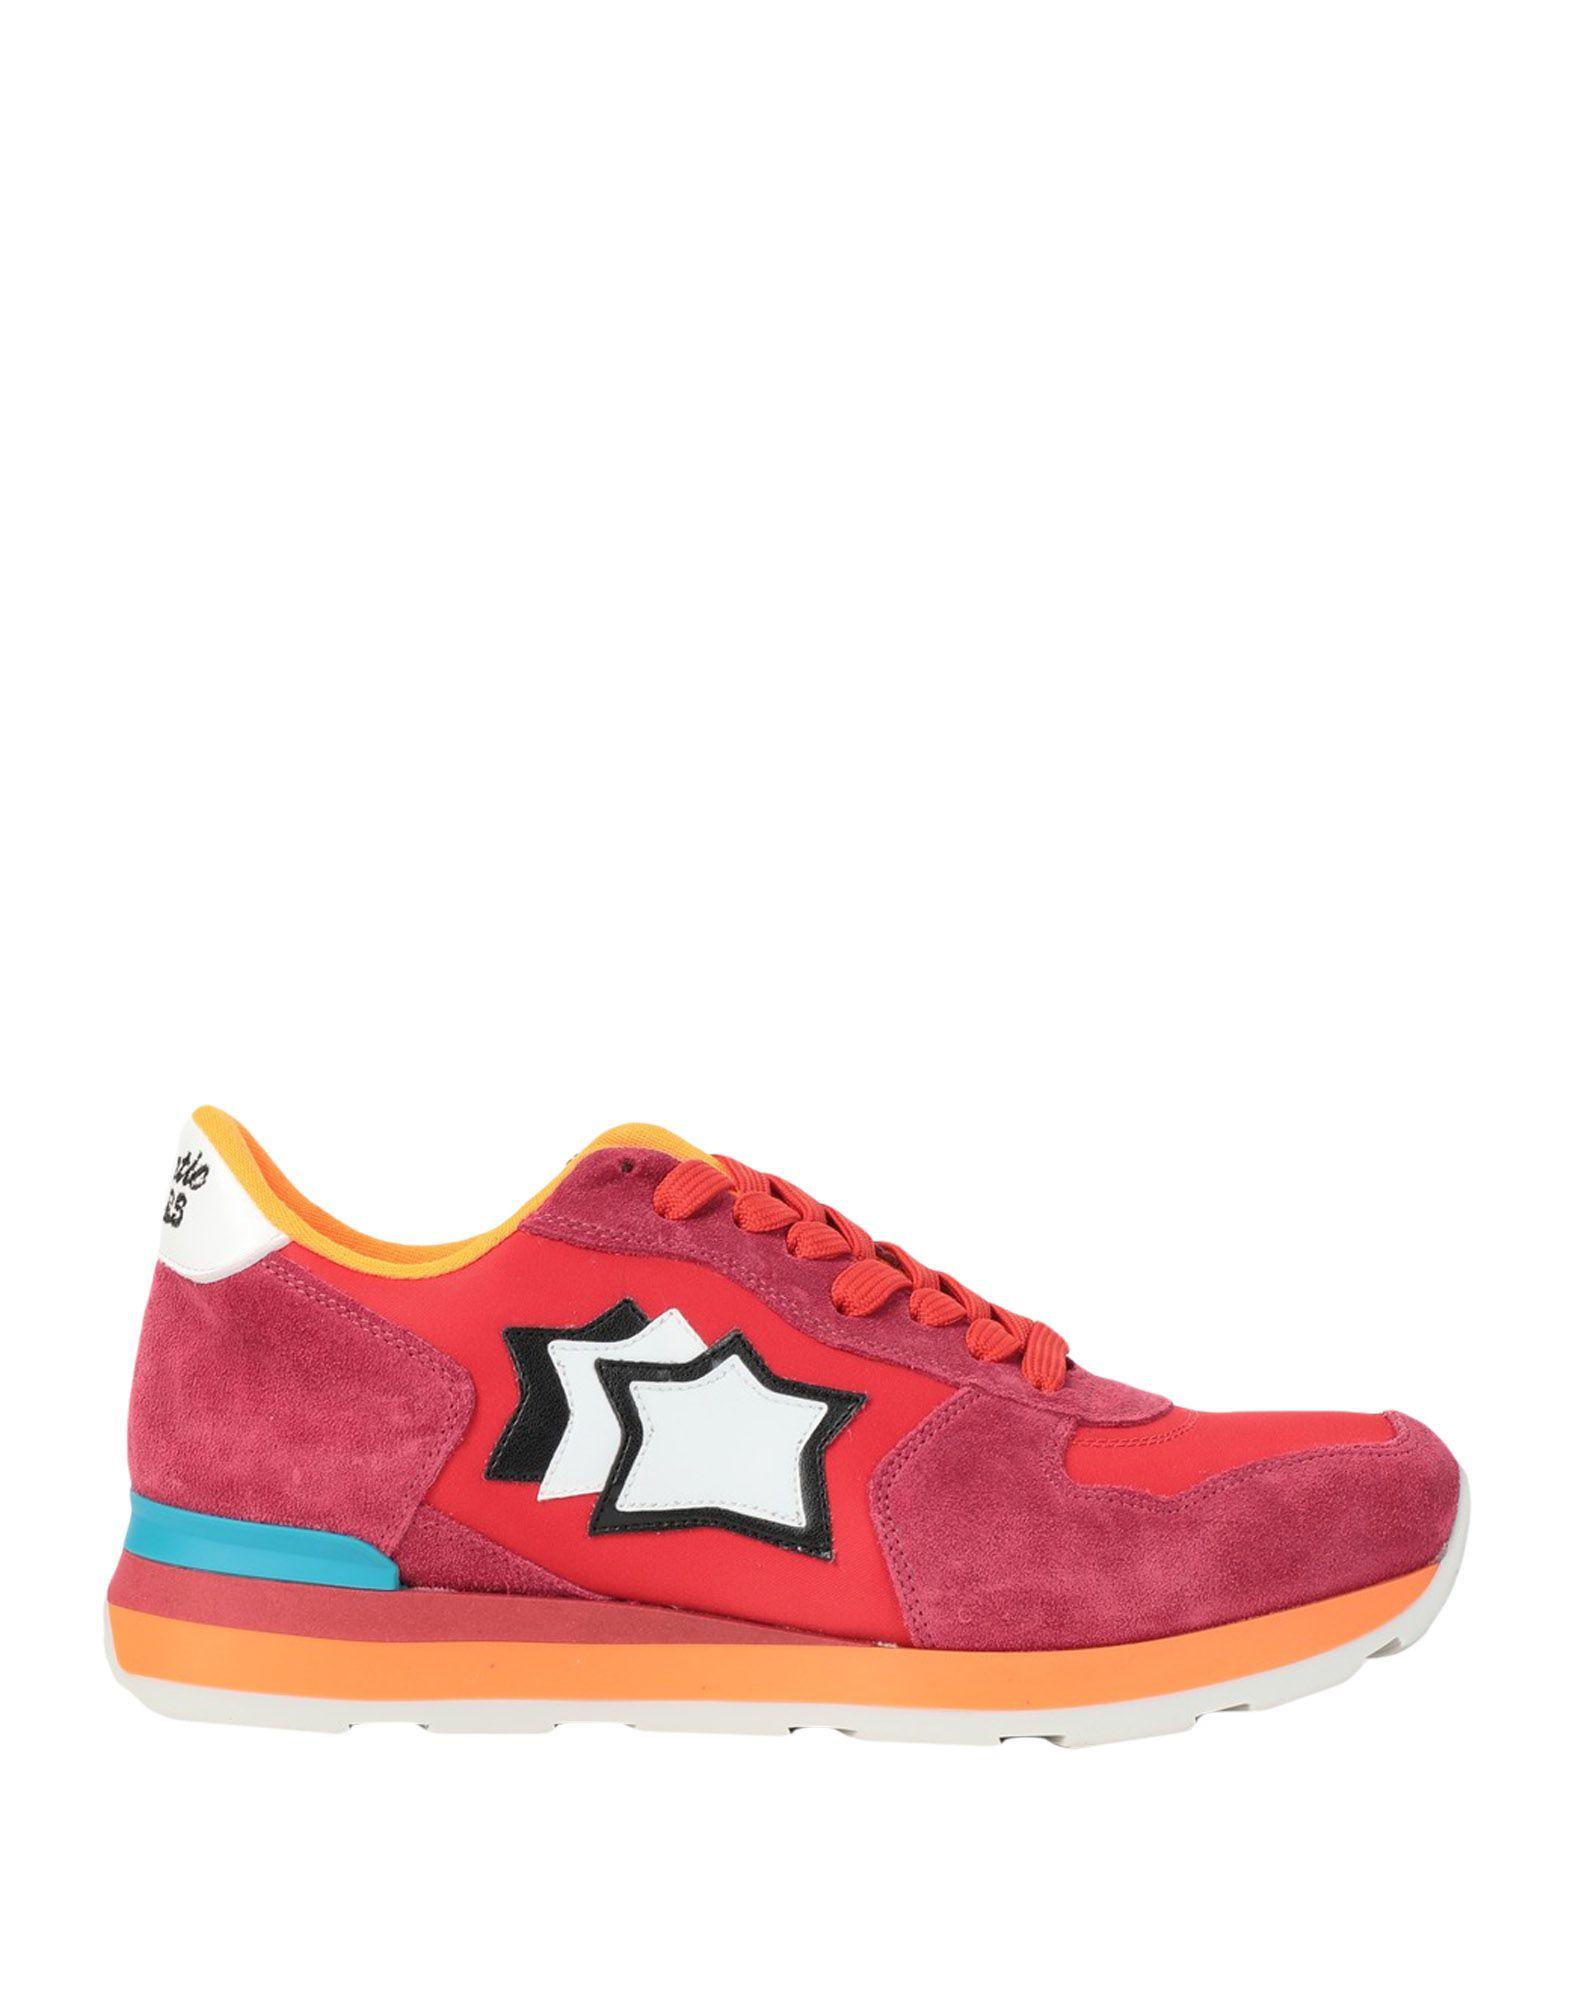 Zapatillas Atlantic Stars Vega - Zapatillas Mujer - Zapatillas - Atlantic Stars  Rojo 3bef05